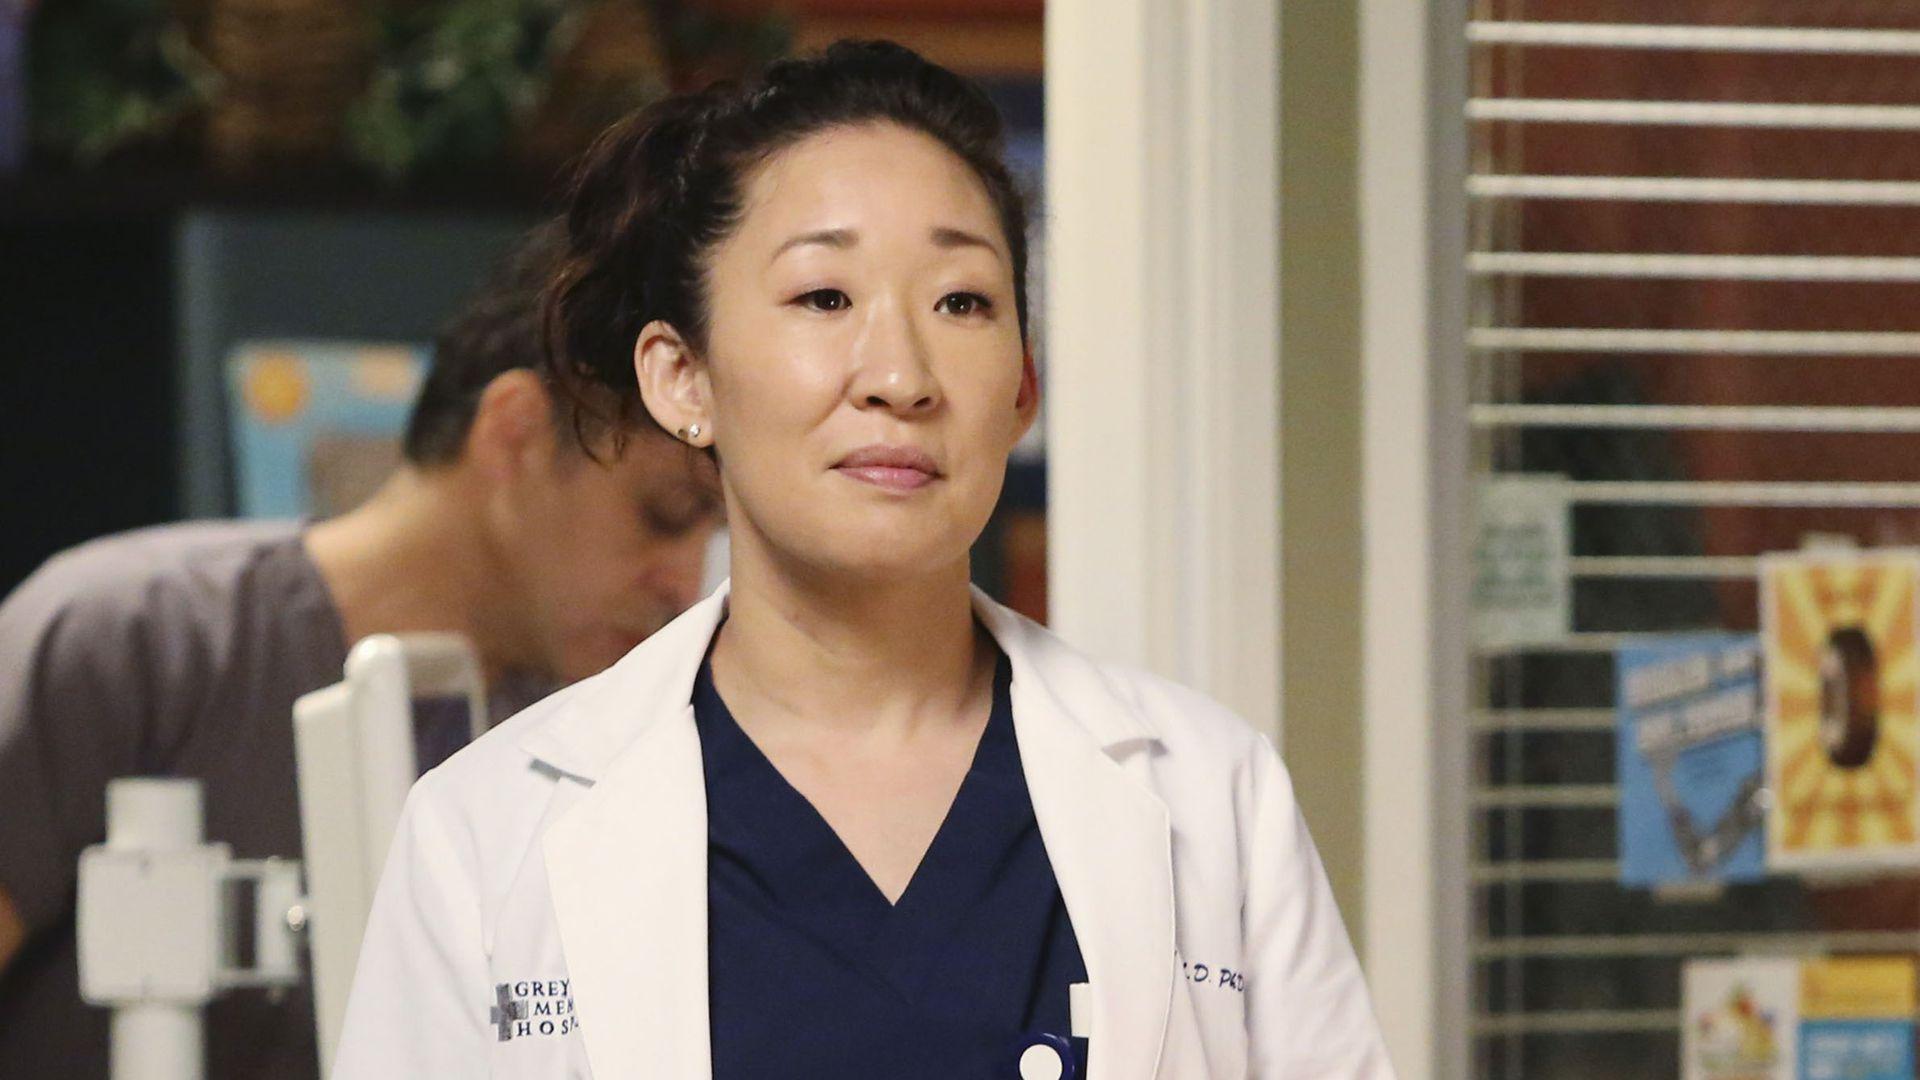 Wahnsinn! Kommt Cristina Yang zurück zu Grey\'s Anatomy? | Promiflash.de